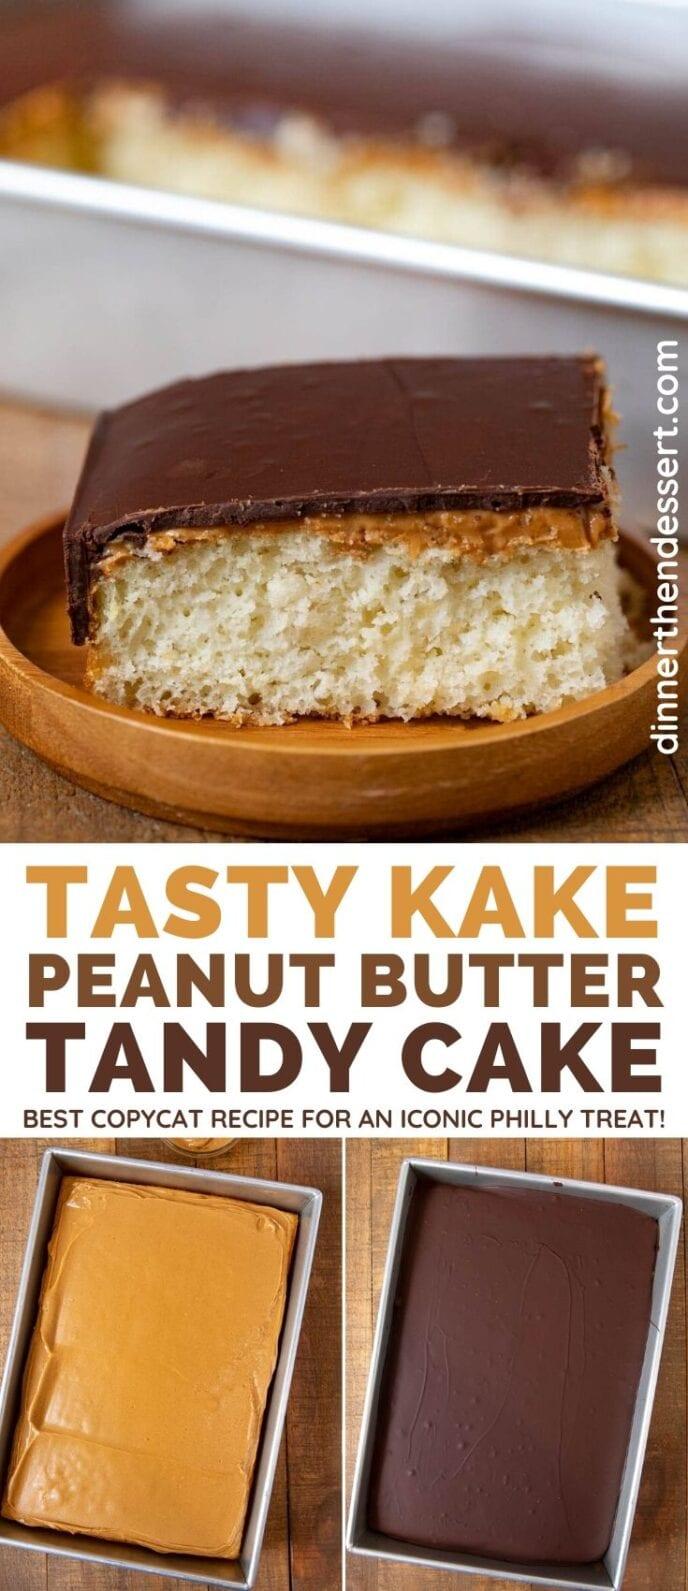 Tasty Kake Peanut Butter Tandy Cake collage